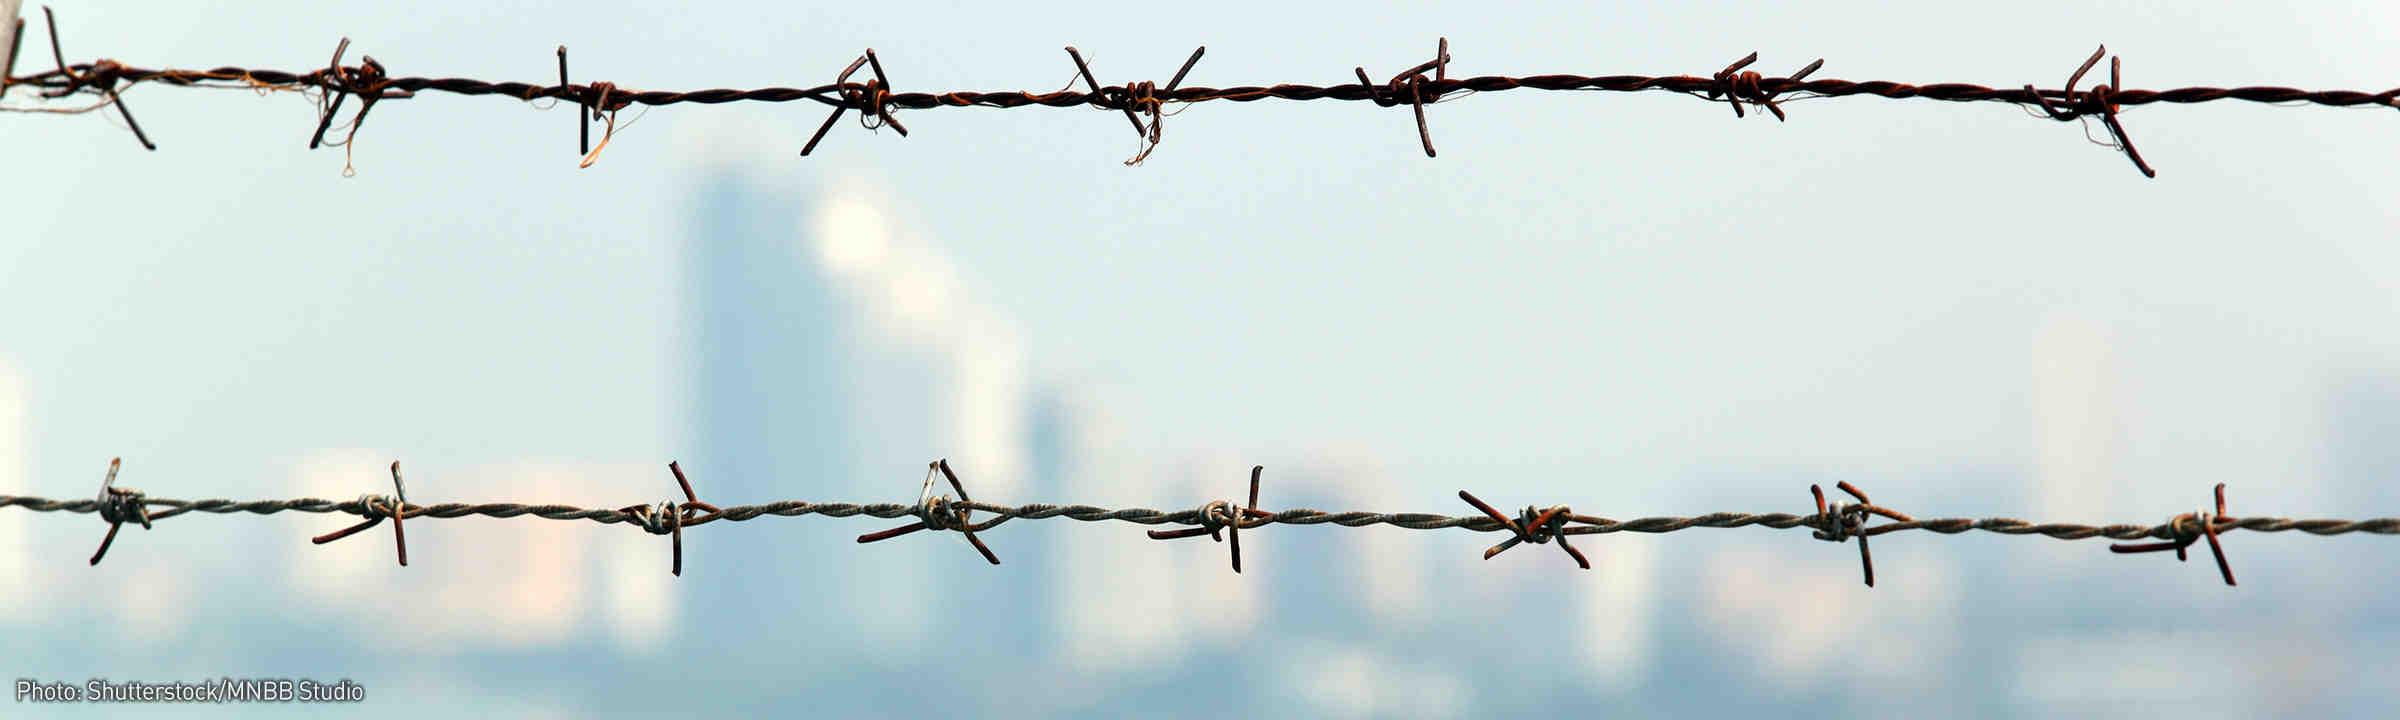 Immigration Detention Resources | American Civil Liberties Union